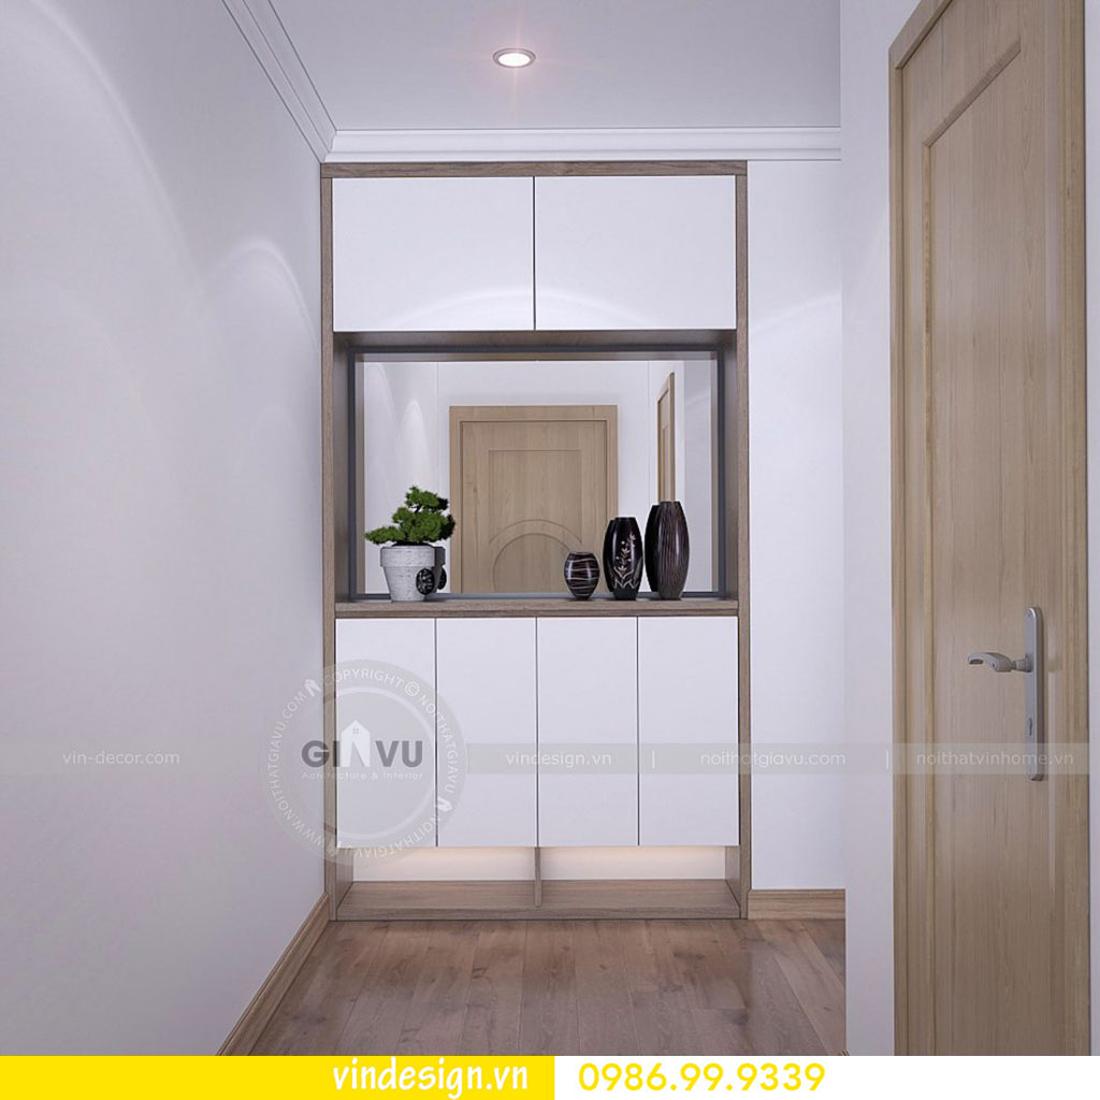 thiết kế nội thất Vinhomes D Capitale call 0986999339 06